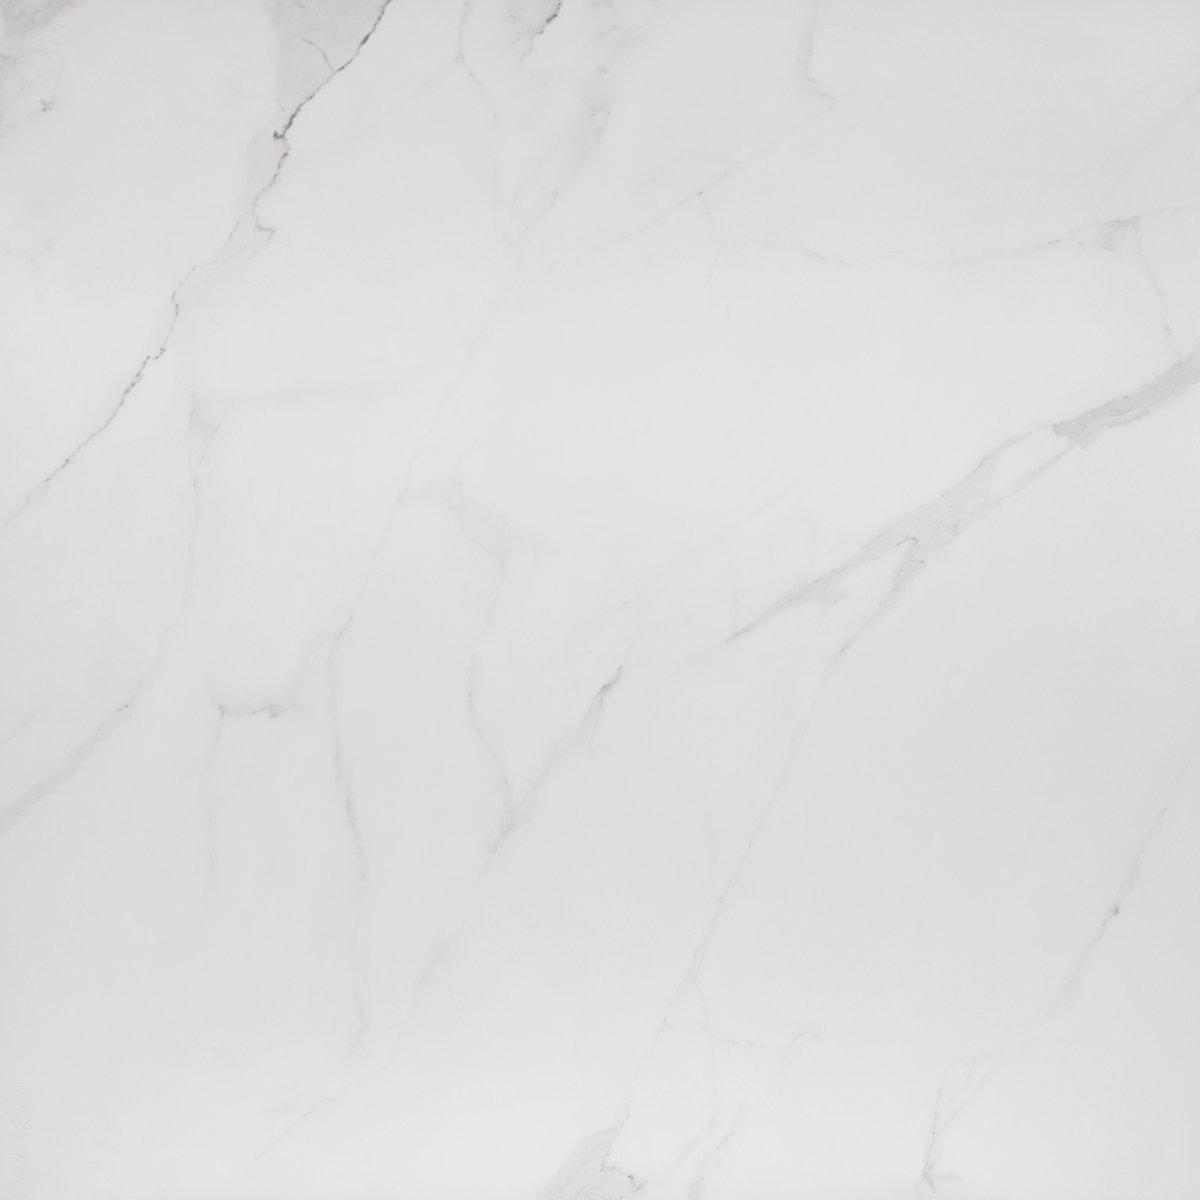 Eli Mont Blanc AC 900x900mm_Stiles_Product4_Image